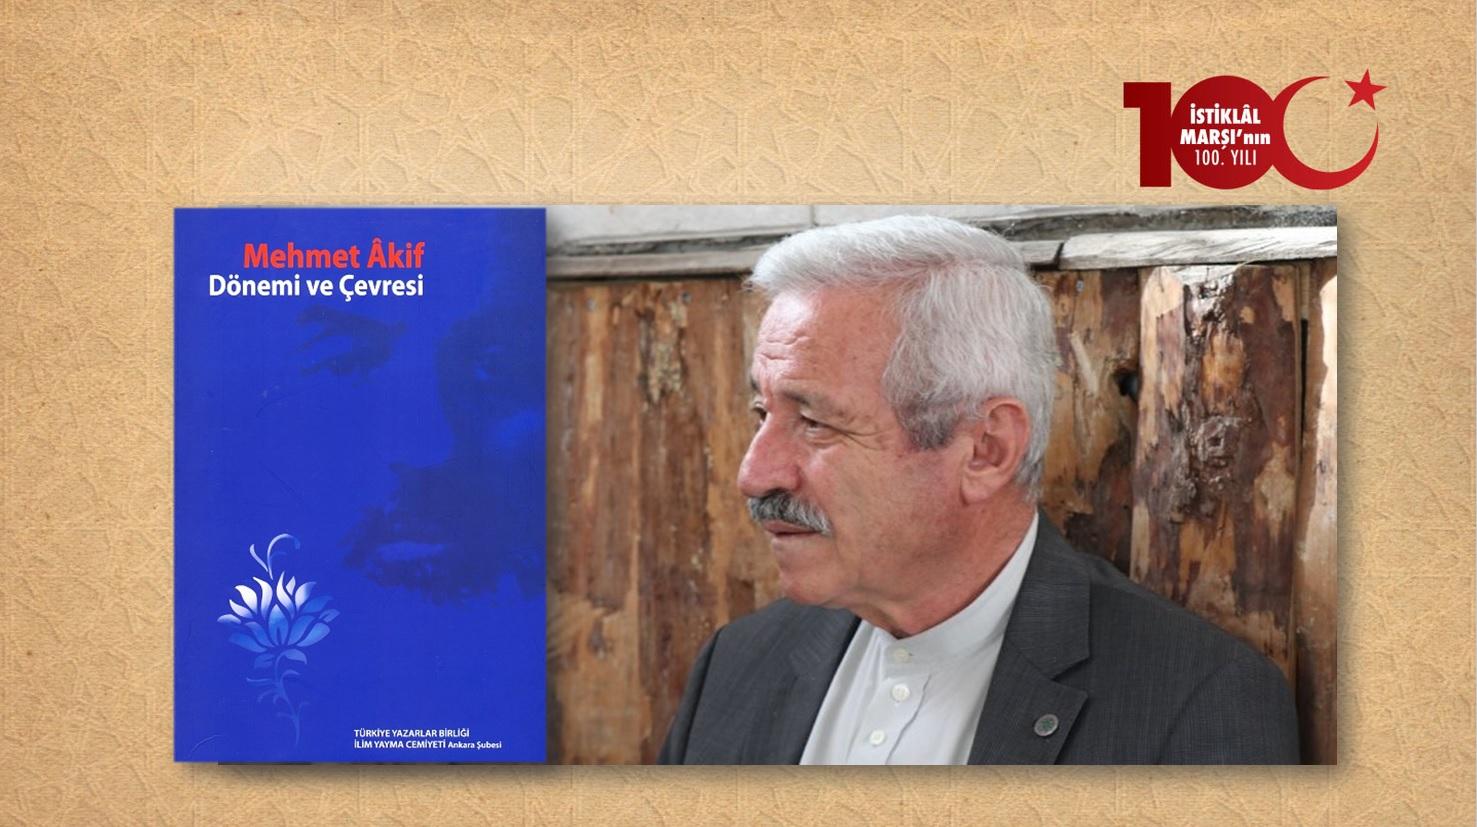 D. Mehmet Doğan: Mehmet Âkif ve Süleyman Nazif